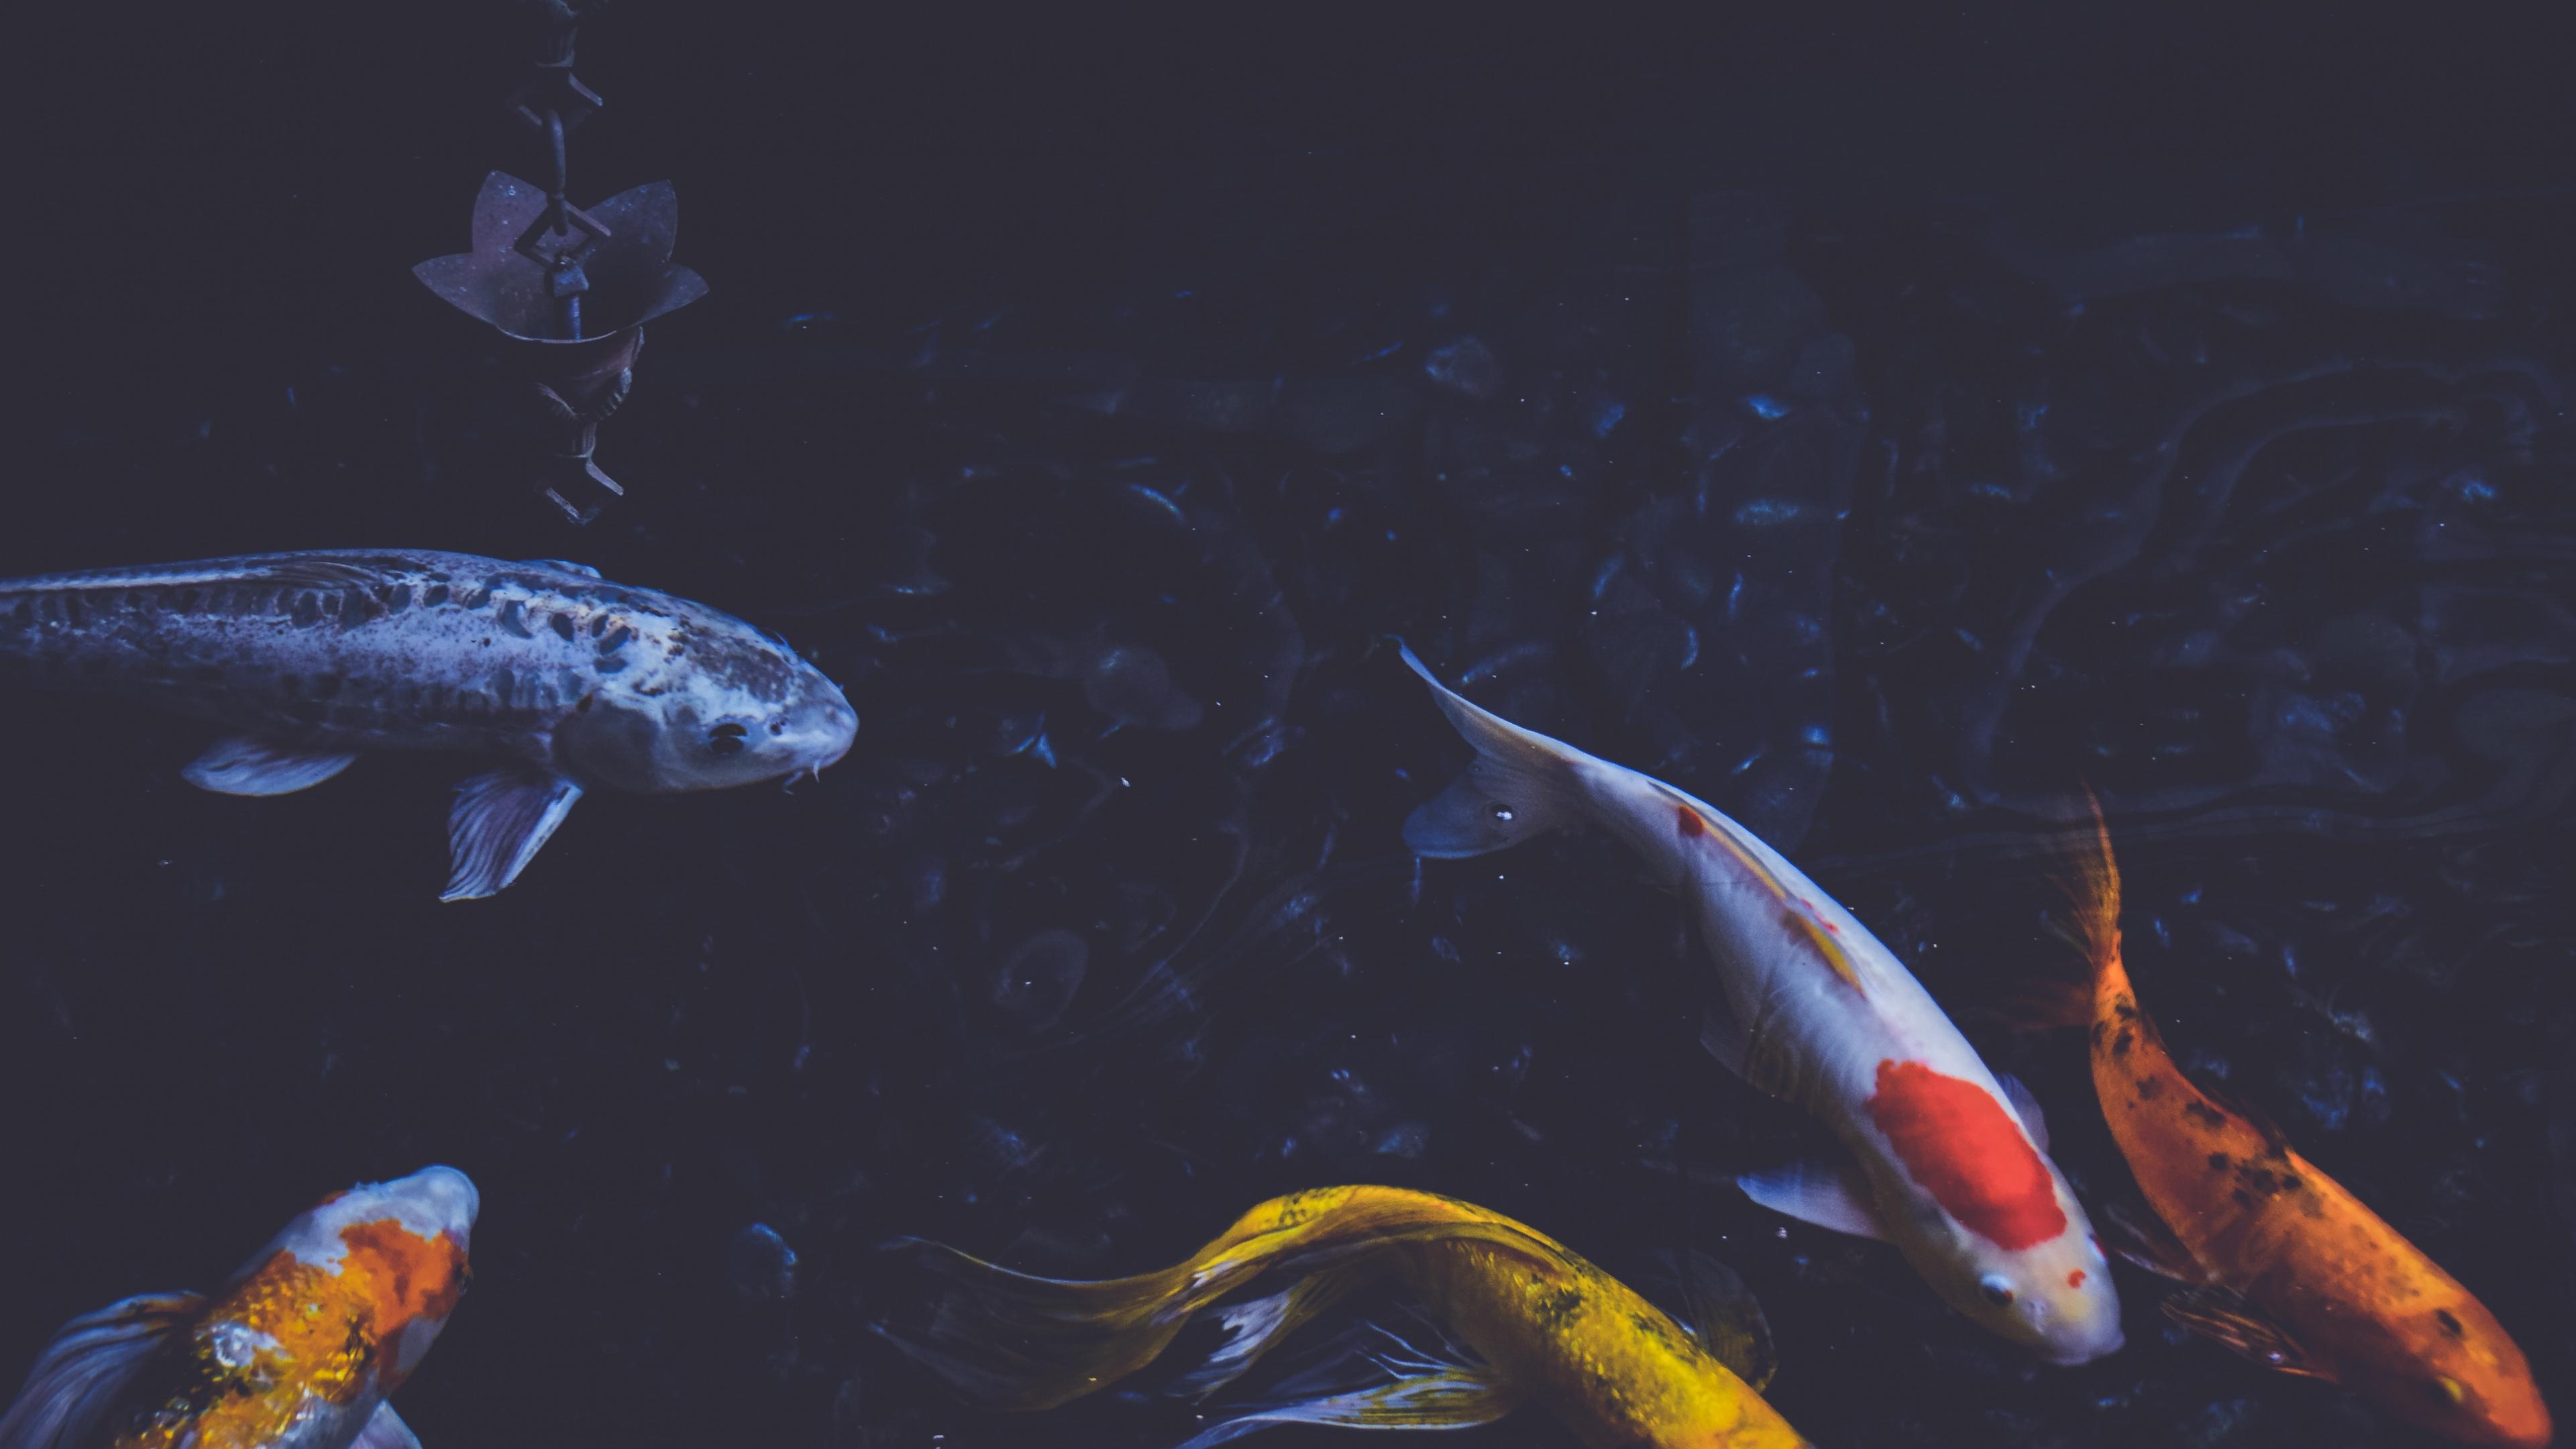 Underwater, Water, Carp, Fish Pond, Koi Hd Wallpaper, - Koi Fish , HD Wallpaper & Backgrounds